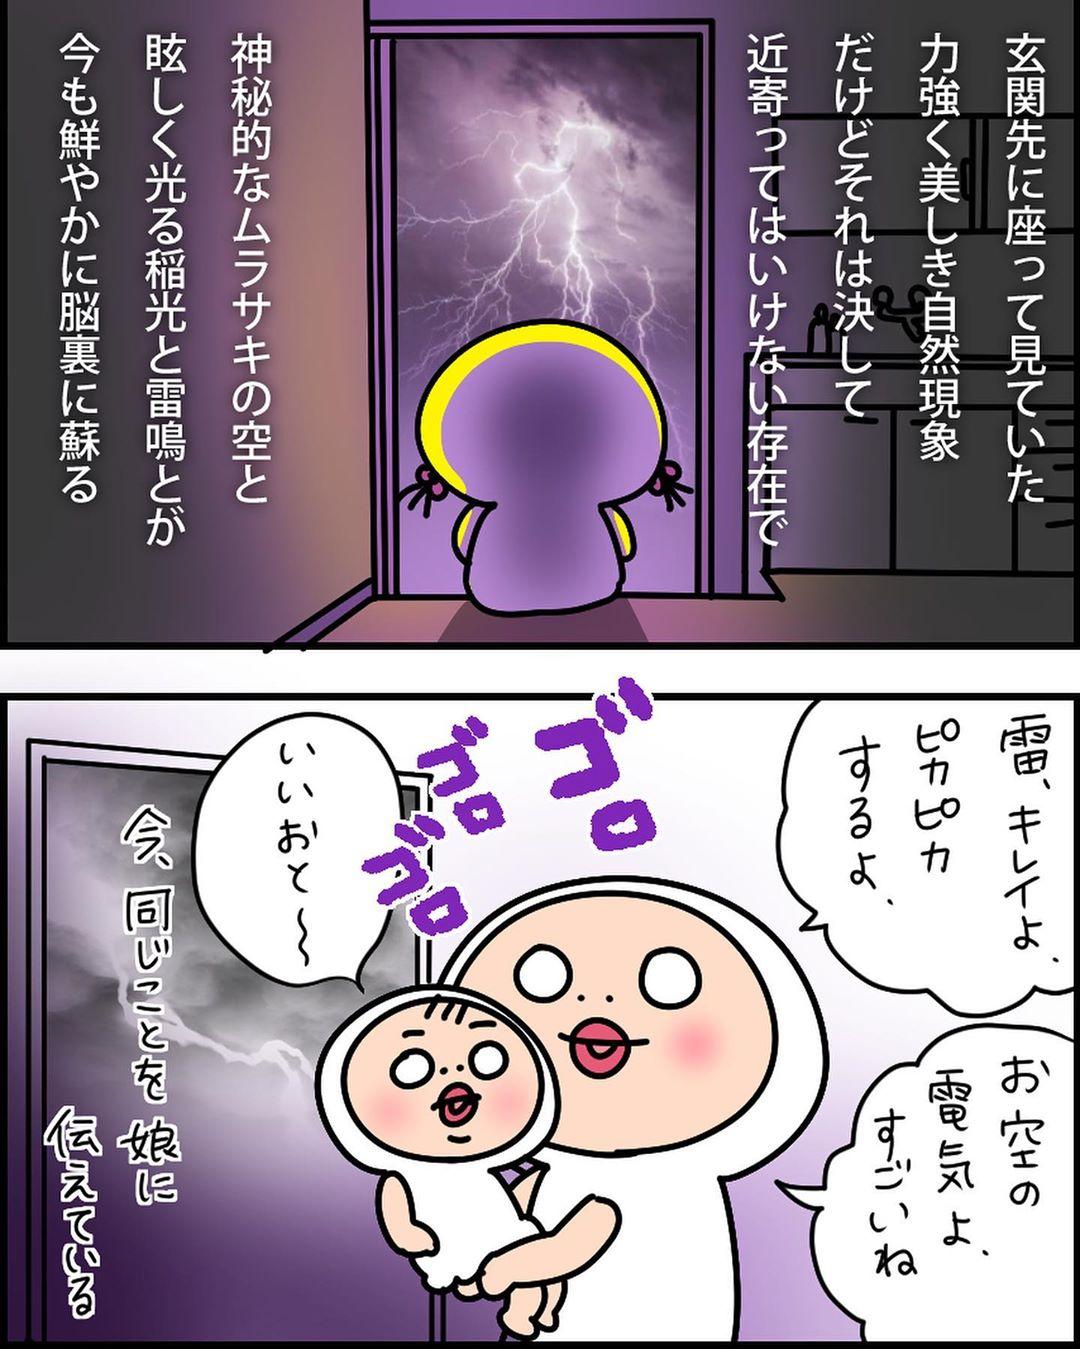 nikunohi029_62421316_687293508395665_7621798263558654152_n